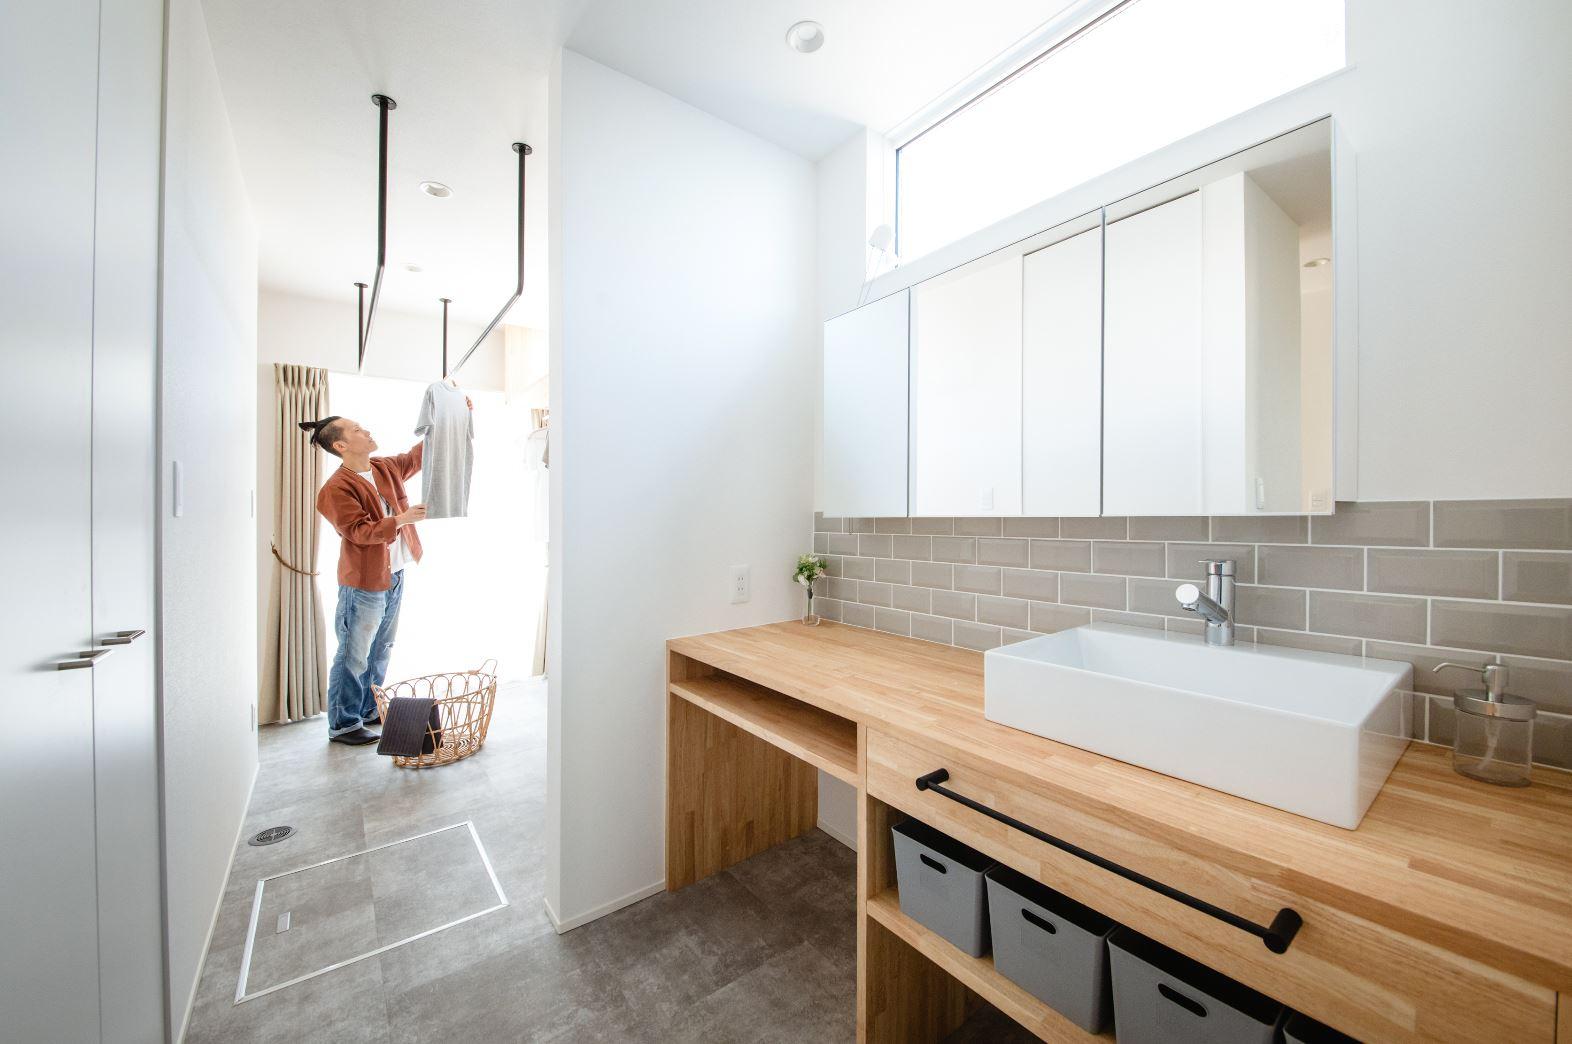 S.CONNECT(エスコネクト)【デザイン住宅、収納力、間取り】家の北面に配置されることが多いランドリースペースを、贅沢にも南面に配置。長い時間を過ごす場所なので、日々の家事作業が明るい場所で楽しくできる